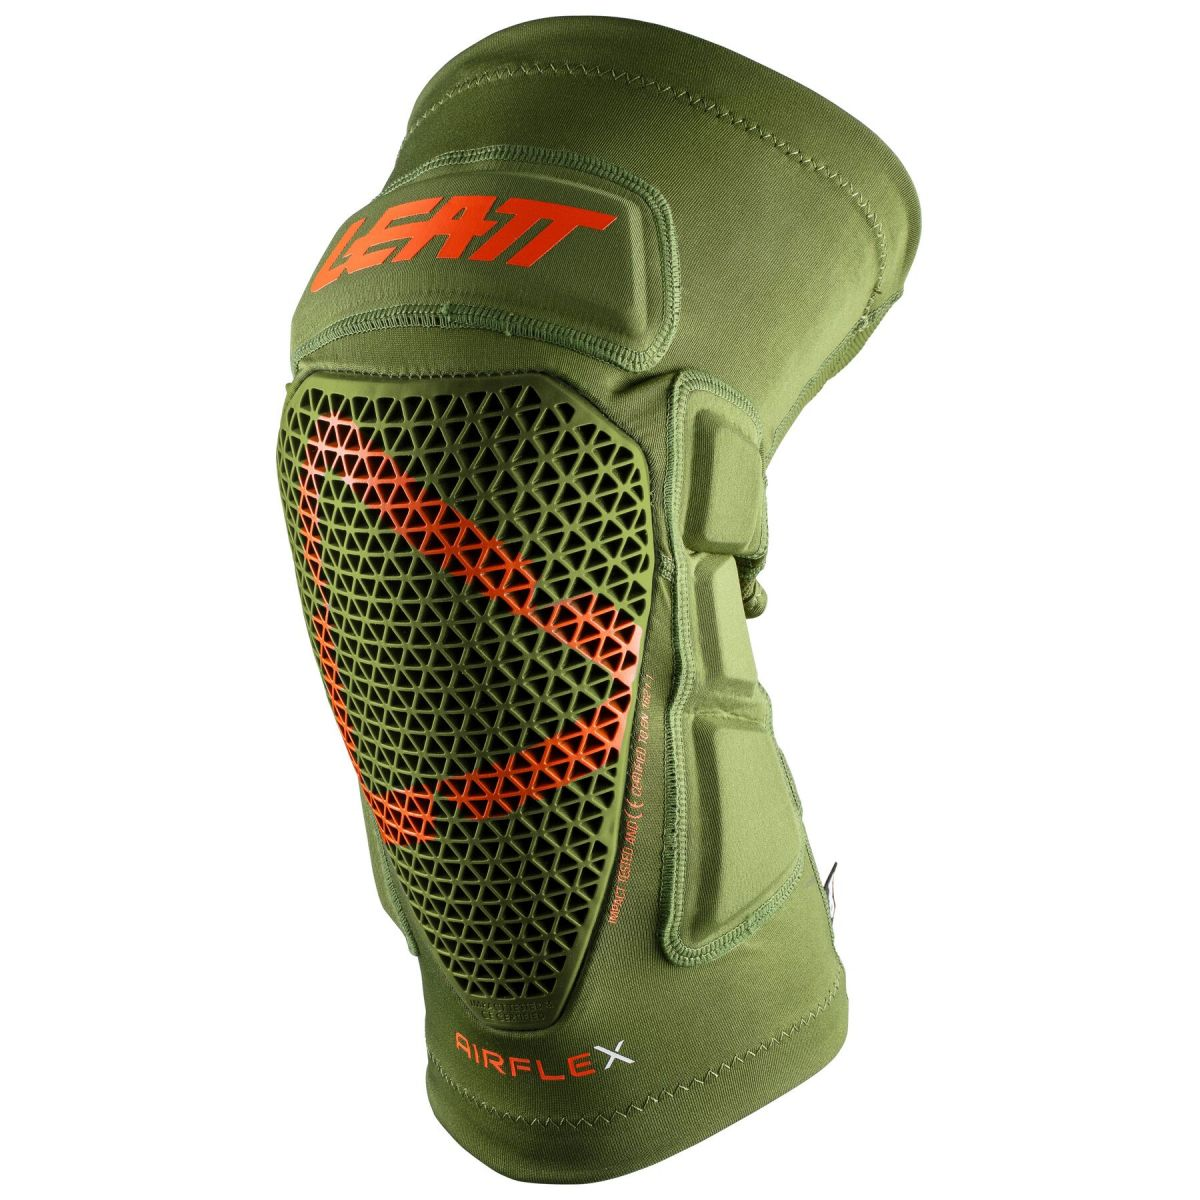 Leatt Airflex Pro Knee Guards Forest защита колен